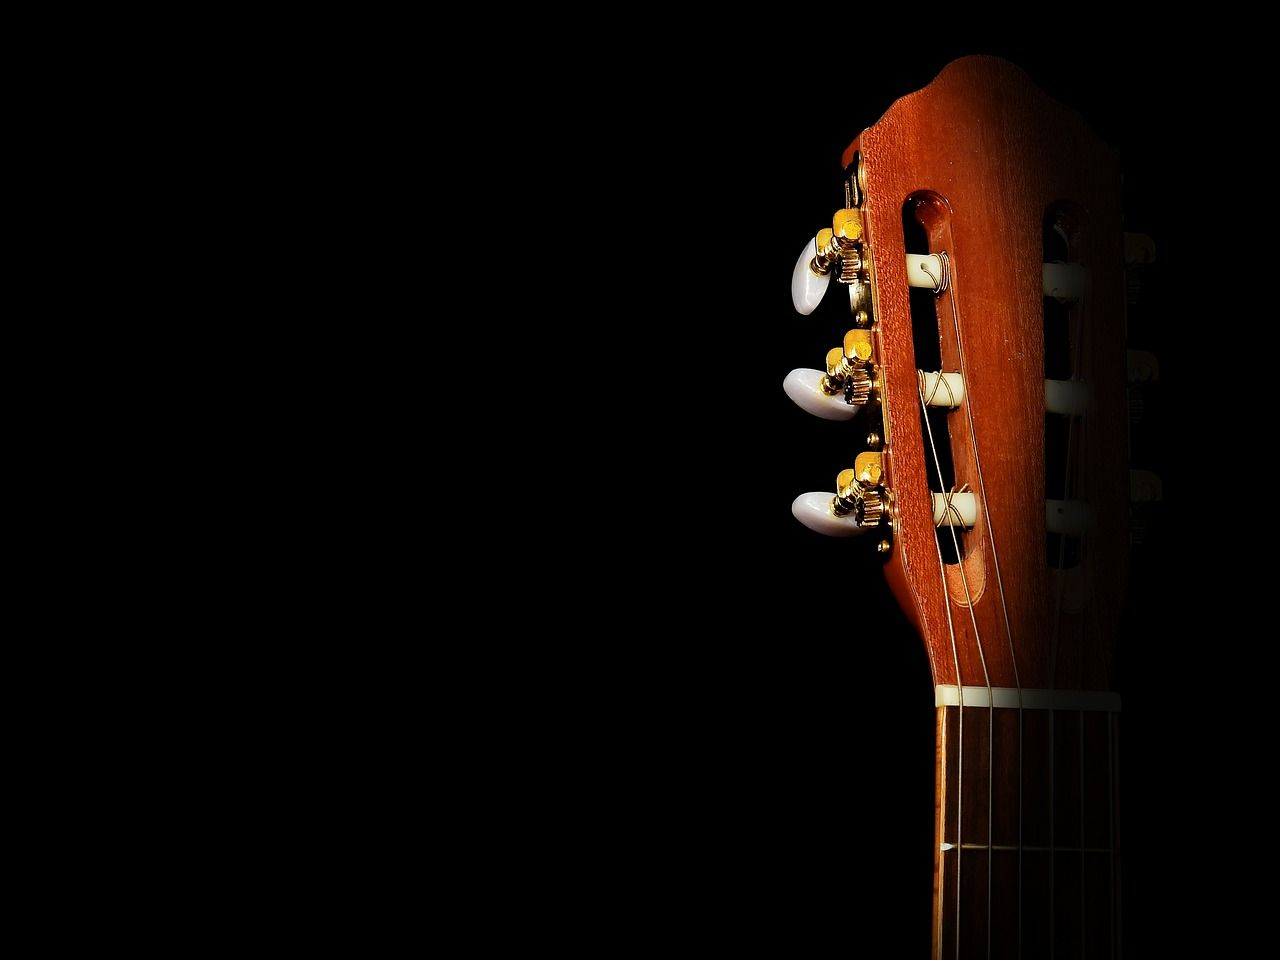 Acoustic Guitar R B Instrumental 2017 Crossroads Instrumental Hip Hop Music Https Www Youtube Com Watch V Vrko3gzg Acoustic Guitar Instrumental Beats R B